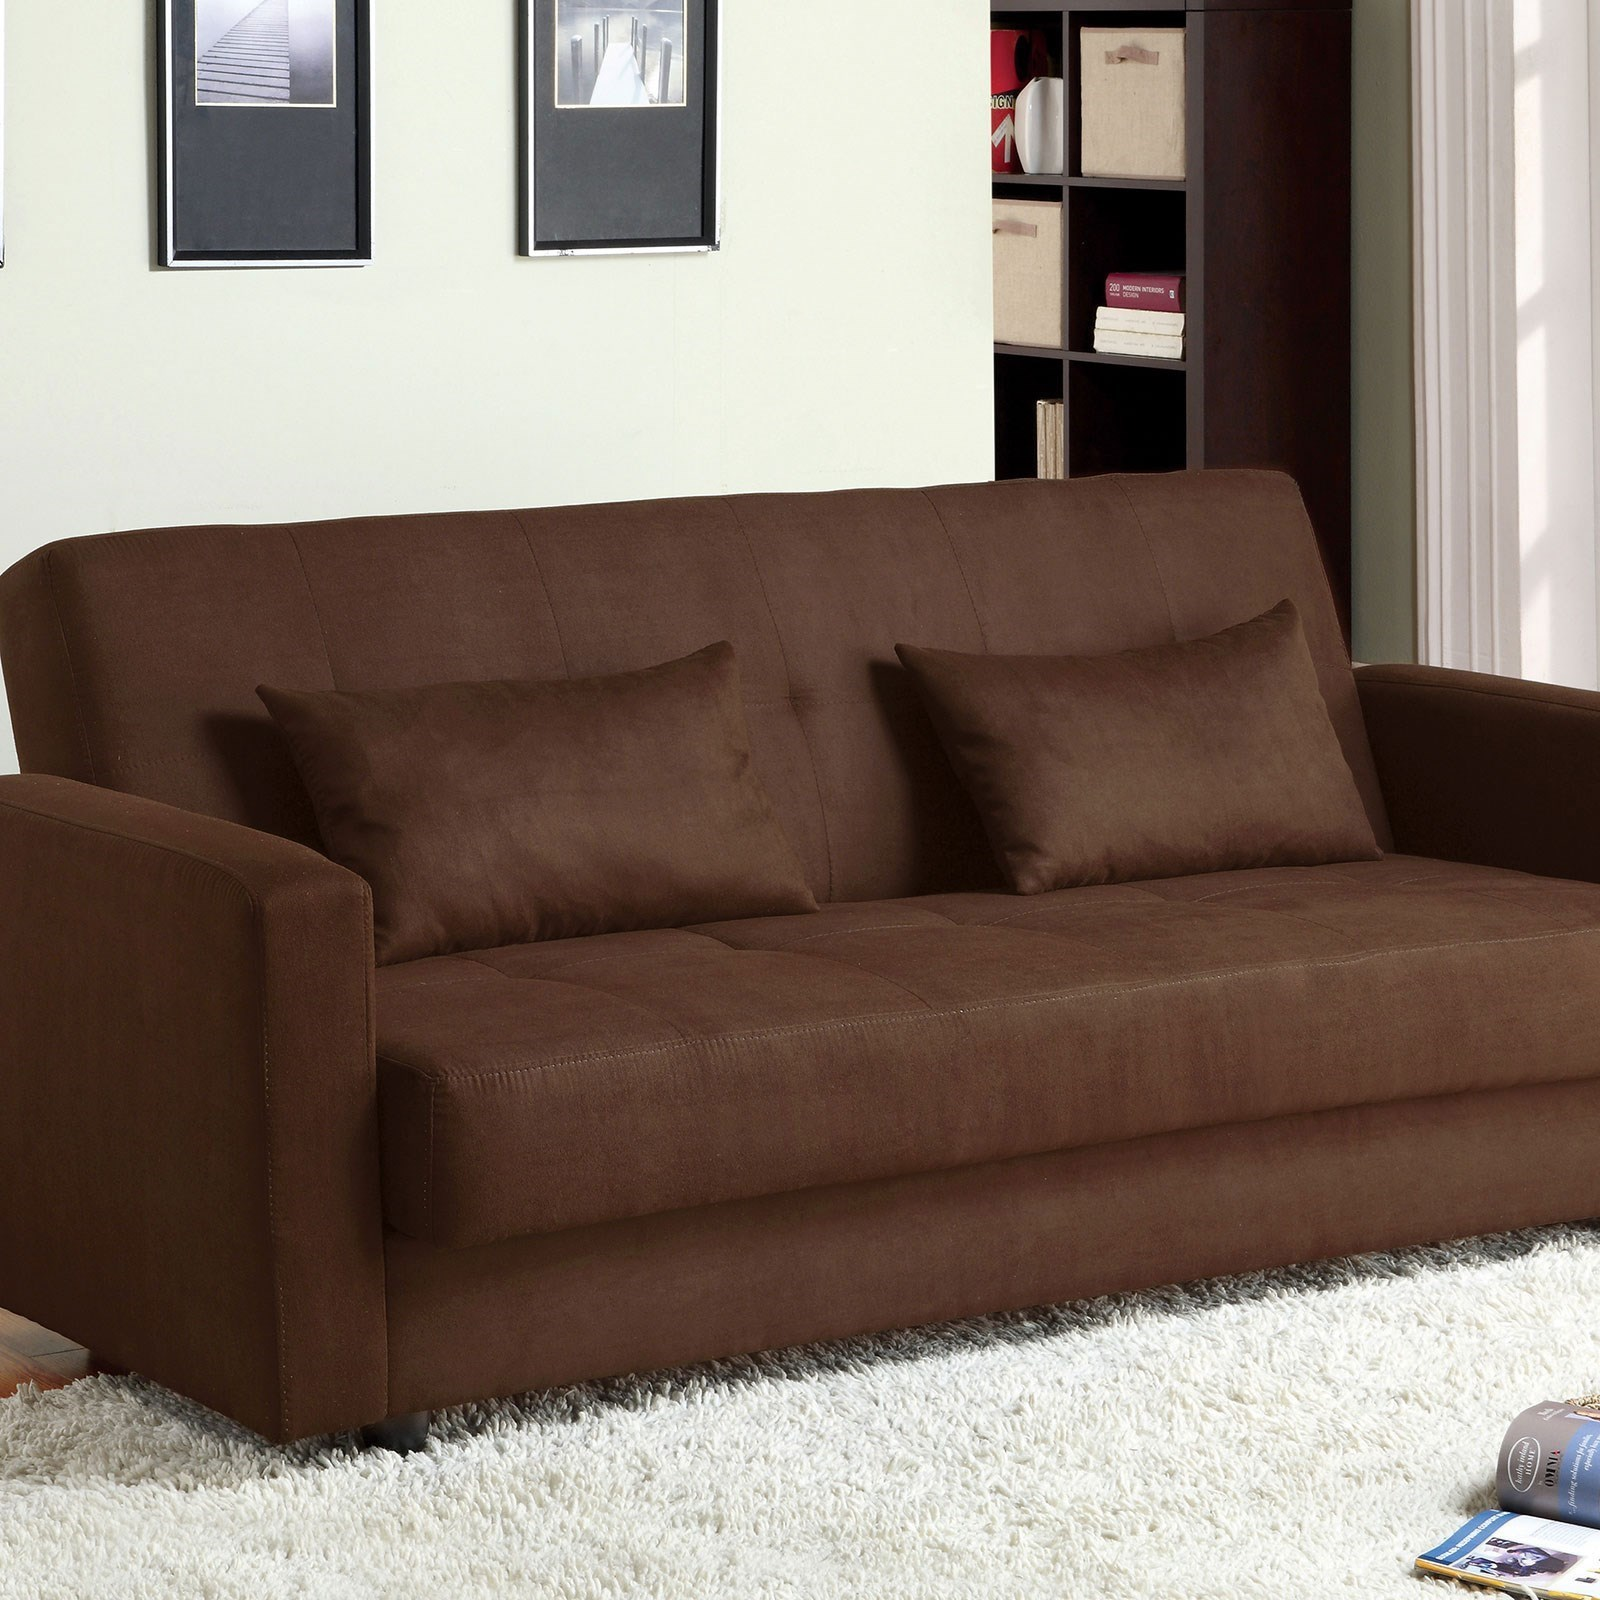 Furniture Of America Jansen Microfiber Futon Sofa With Storage Dream Home Interiors Futons